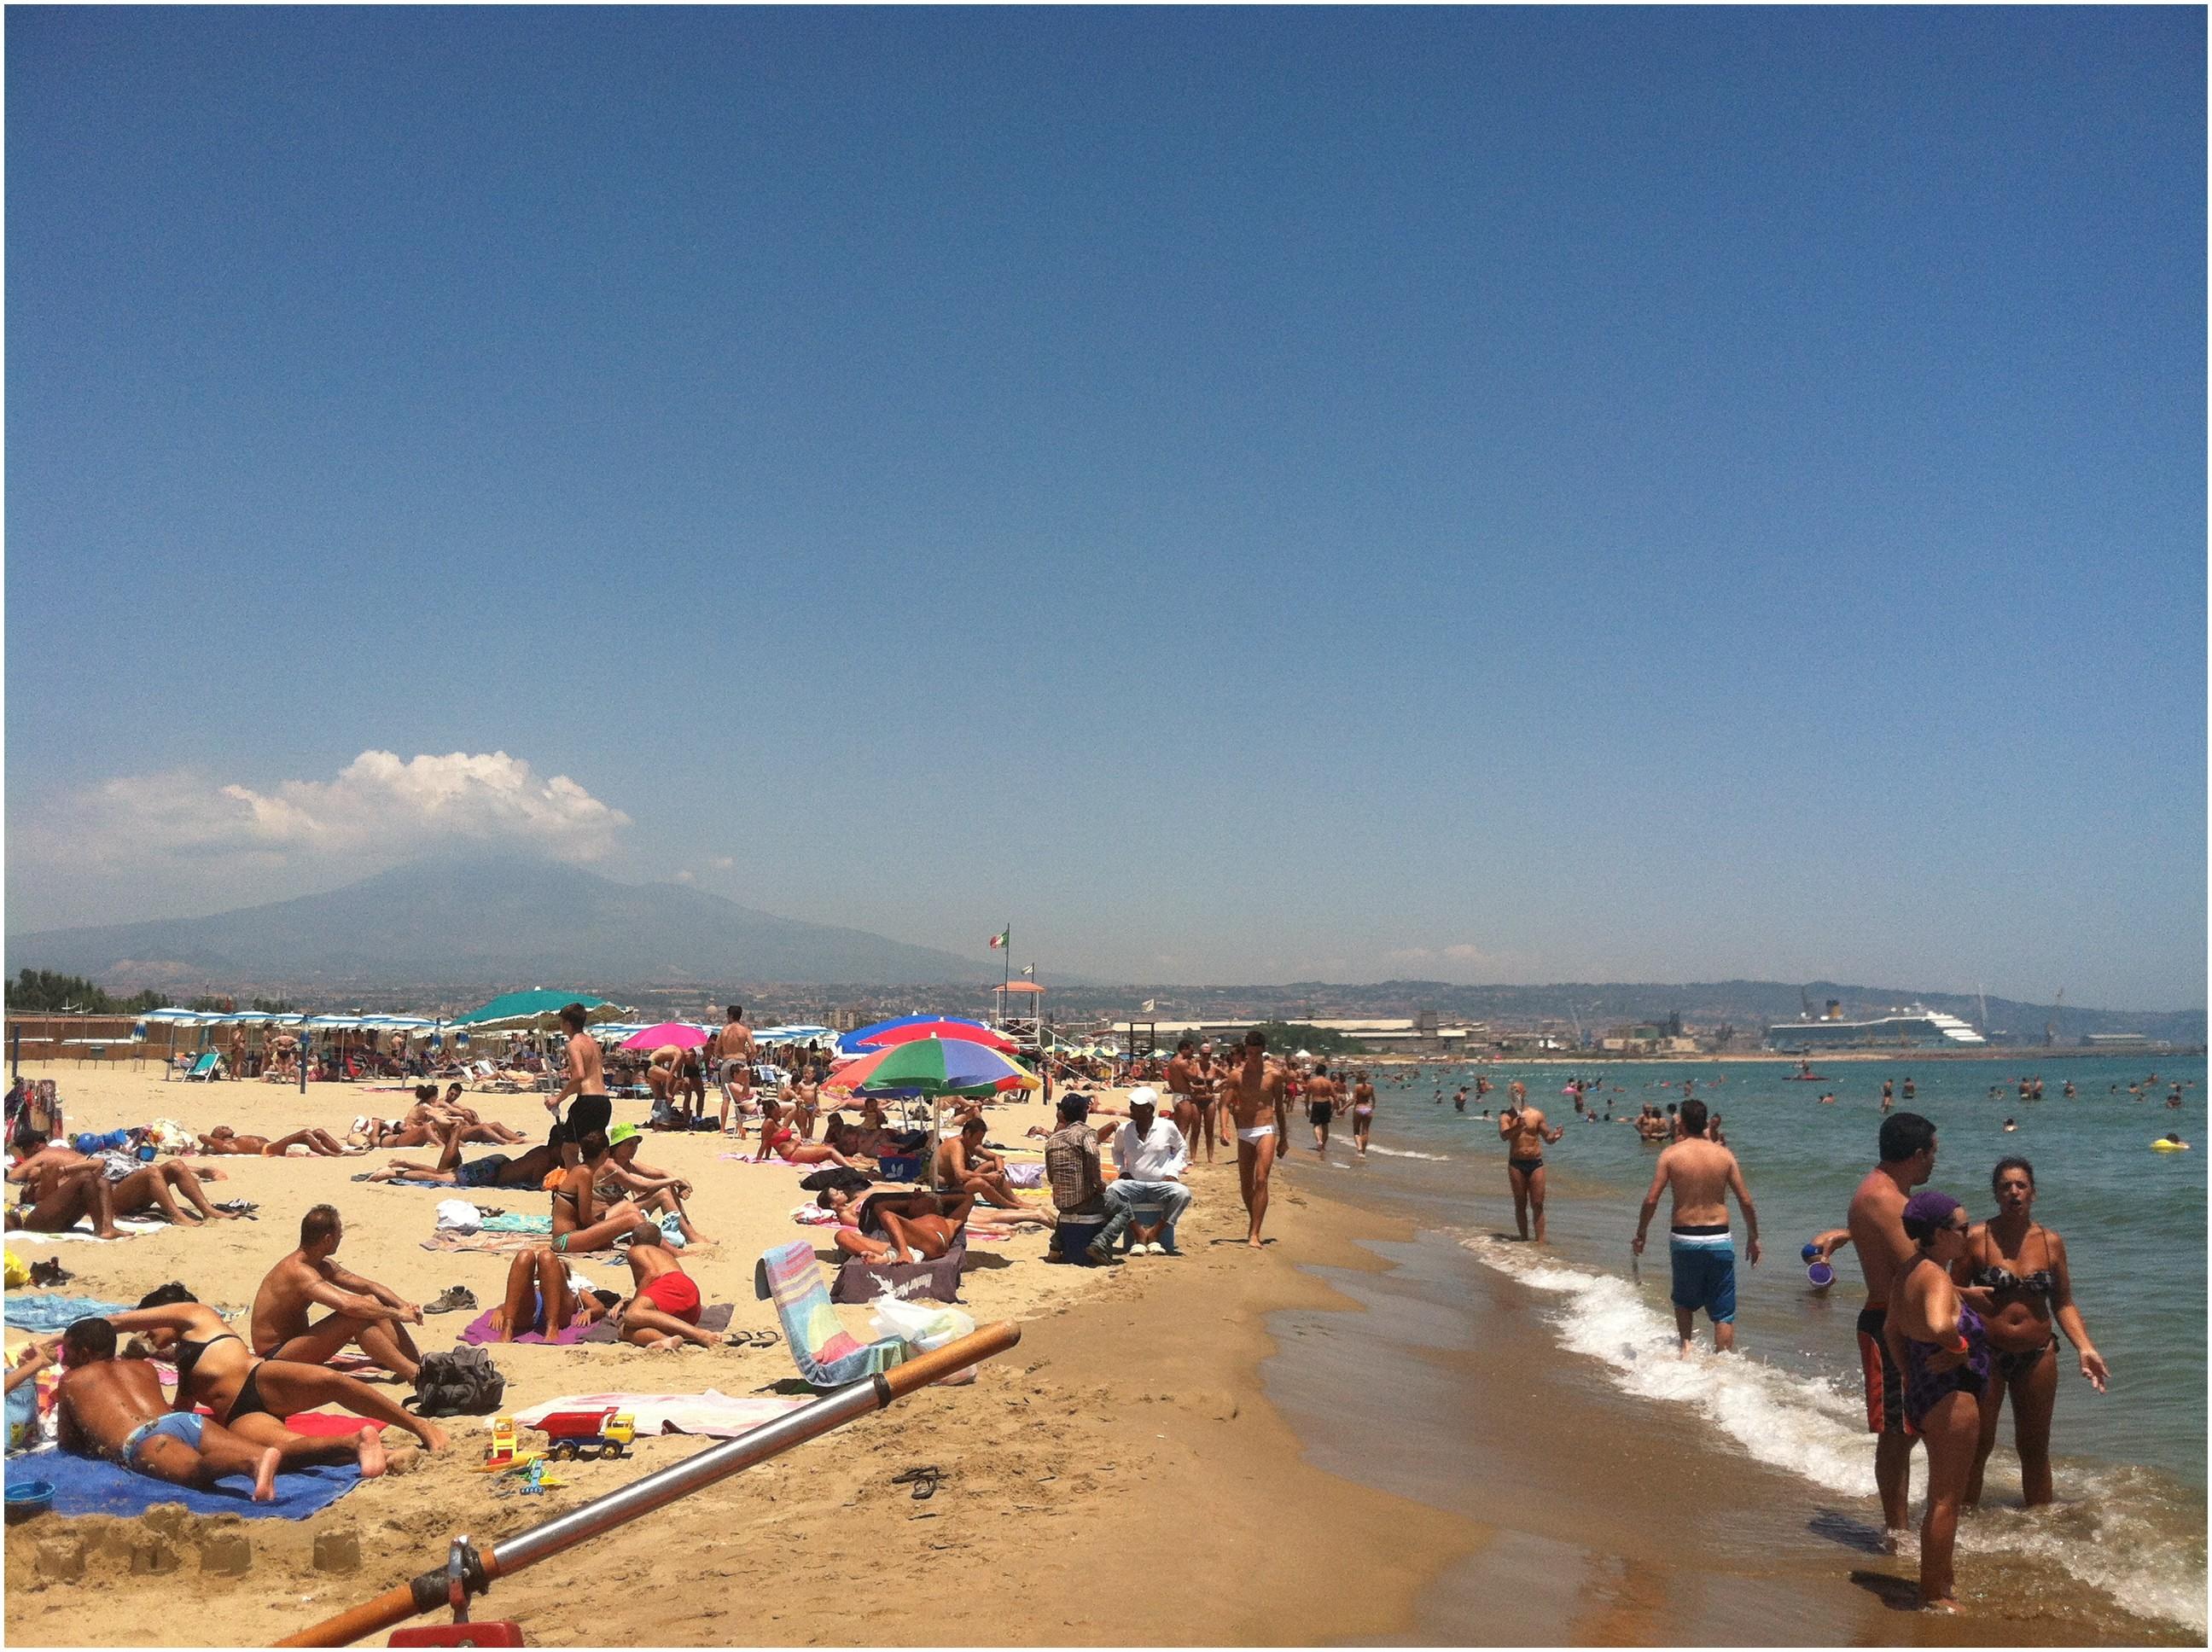 Beach In Catania Italy Luxury Arrivederci Catania